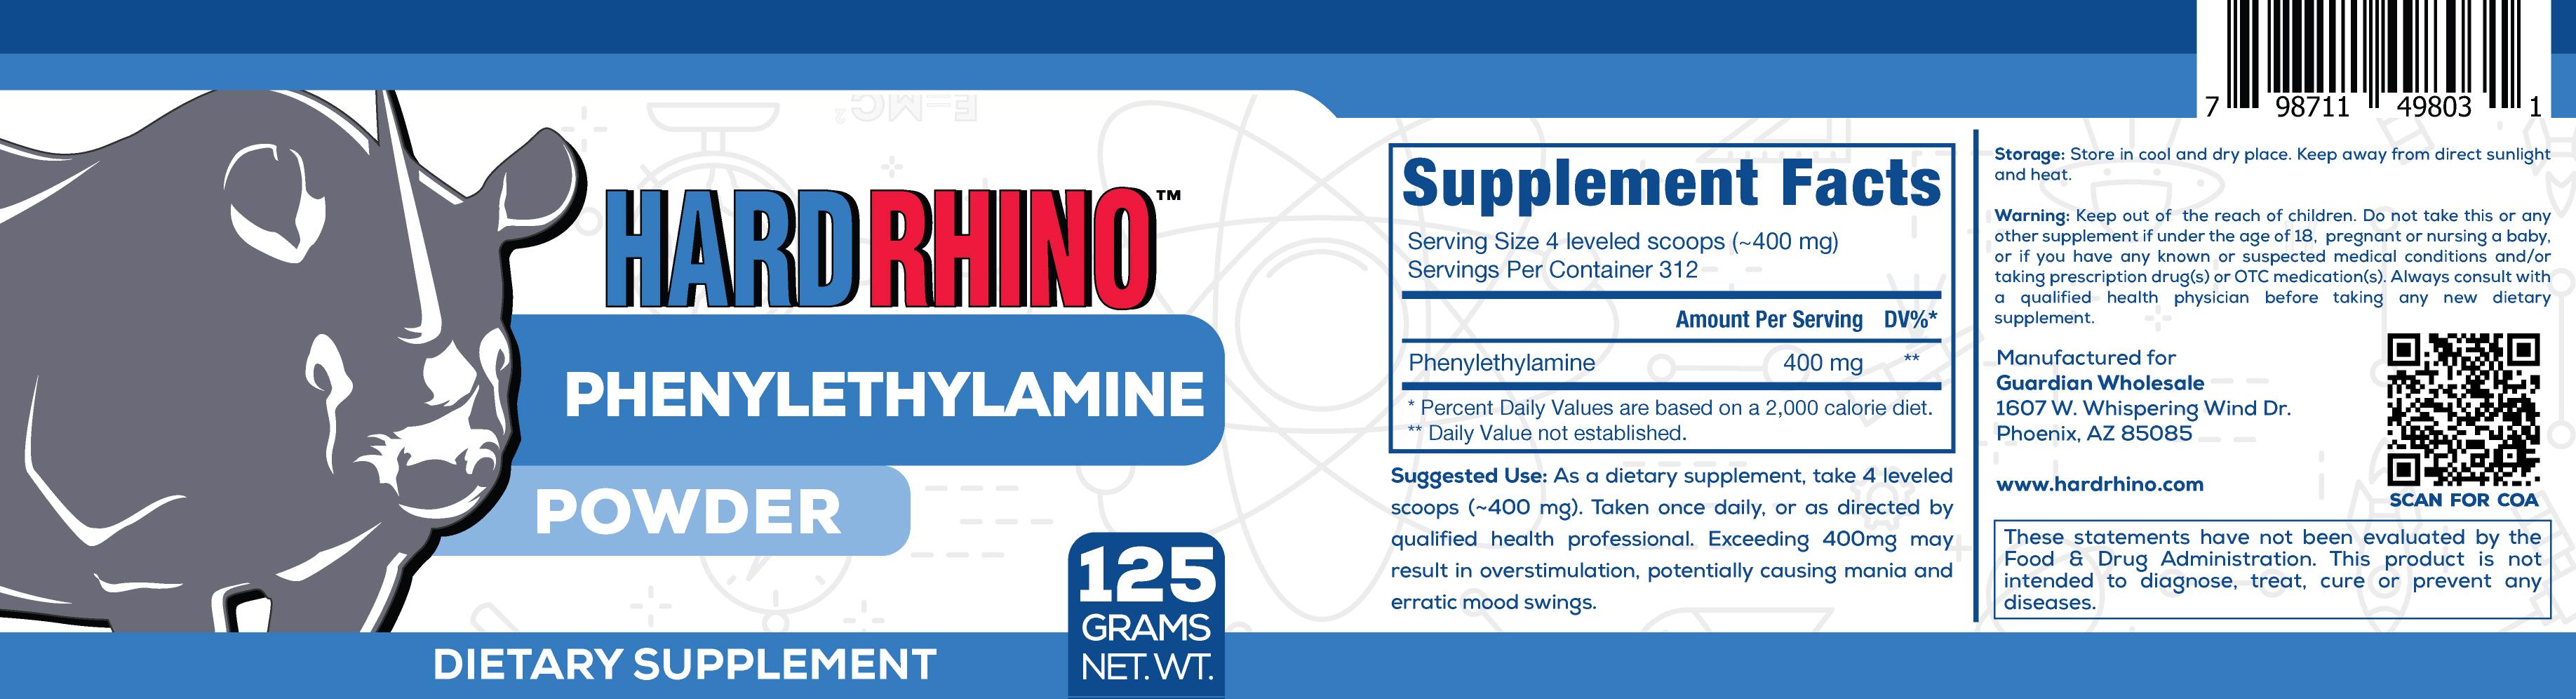 choline-complex-dmae-400mg-120-count-3.25x7.50-hr.jpg